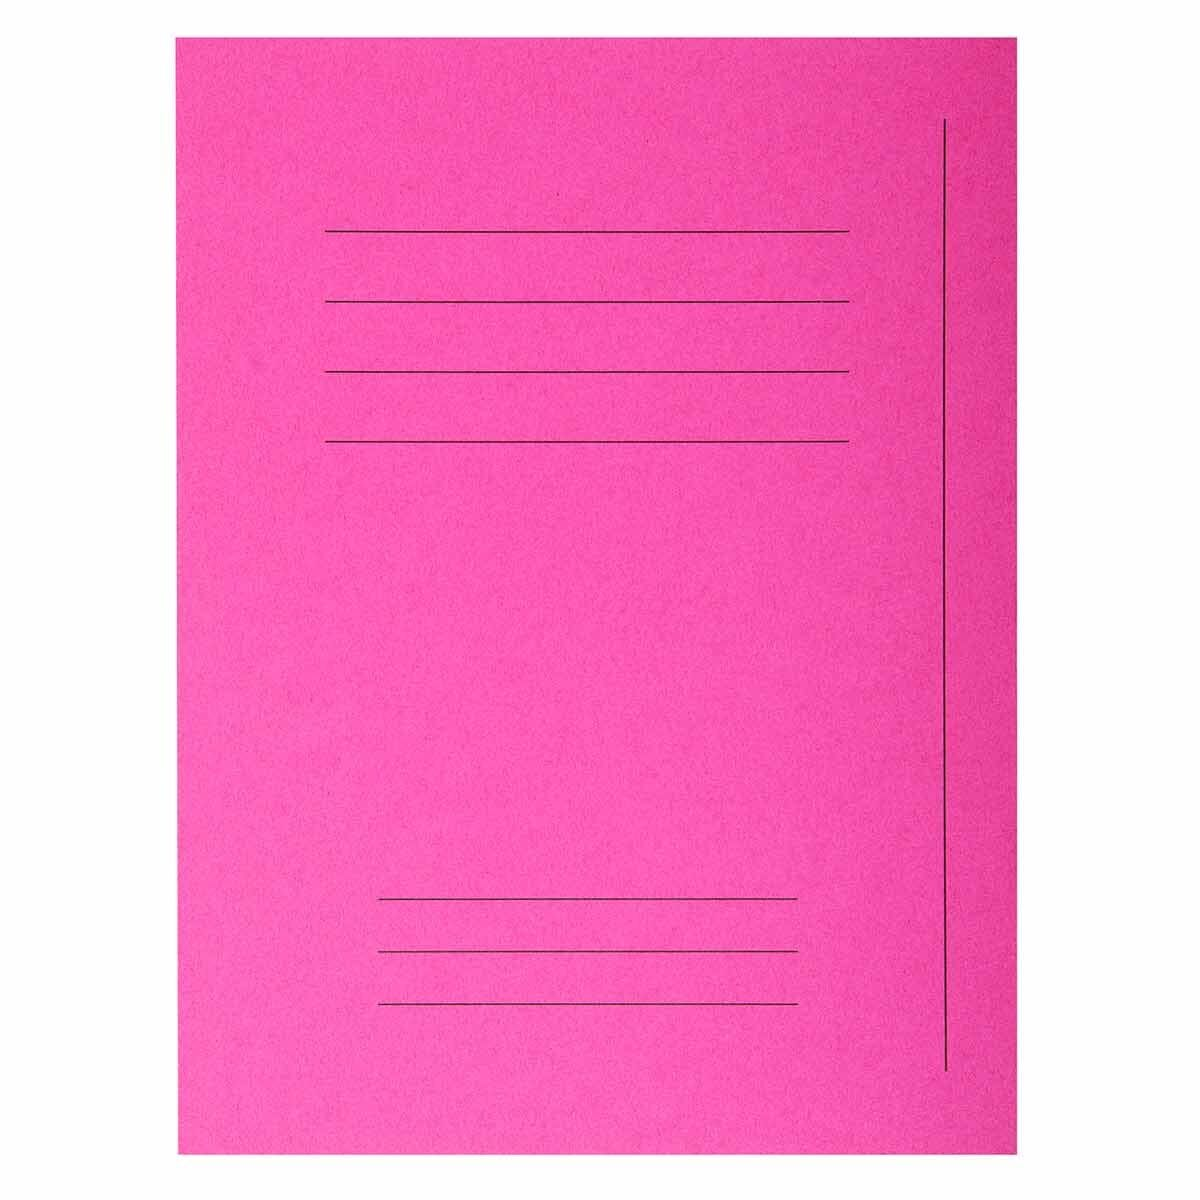 Exacompta Forever Square Cut Folders Printed Pack of 250 Fuchsia